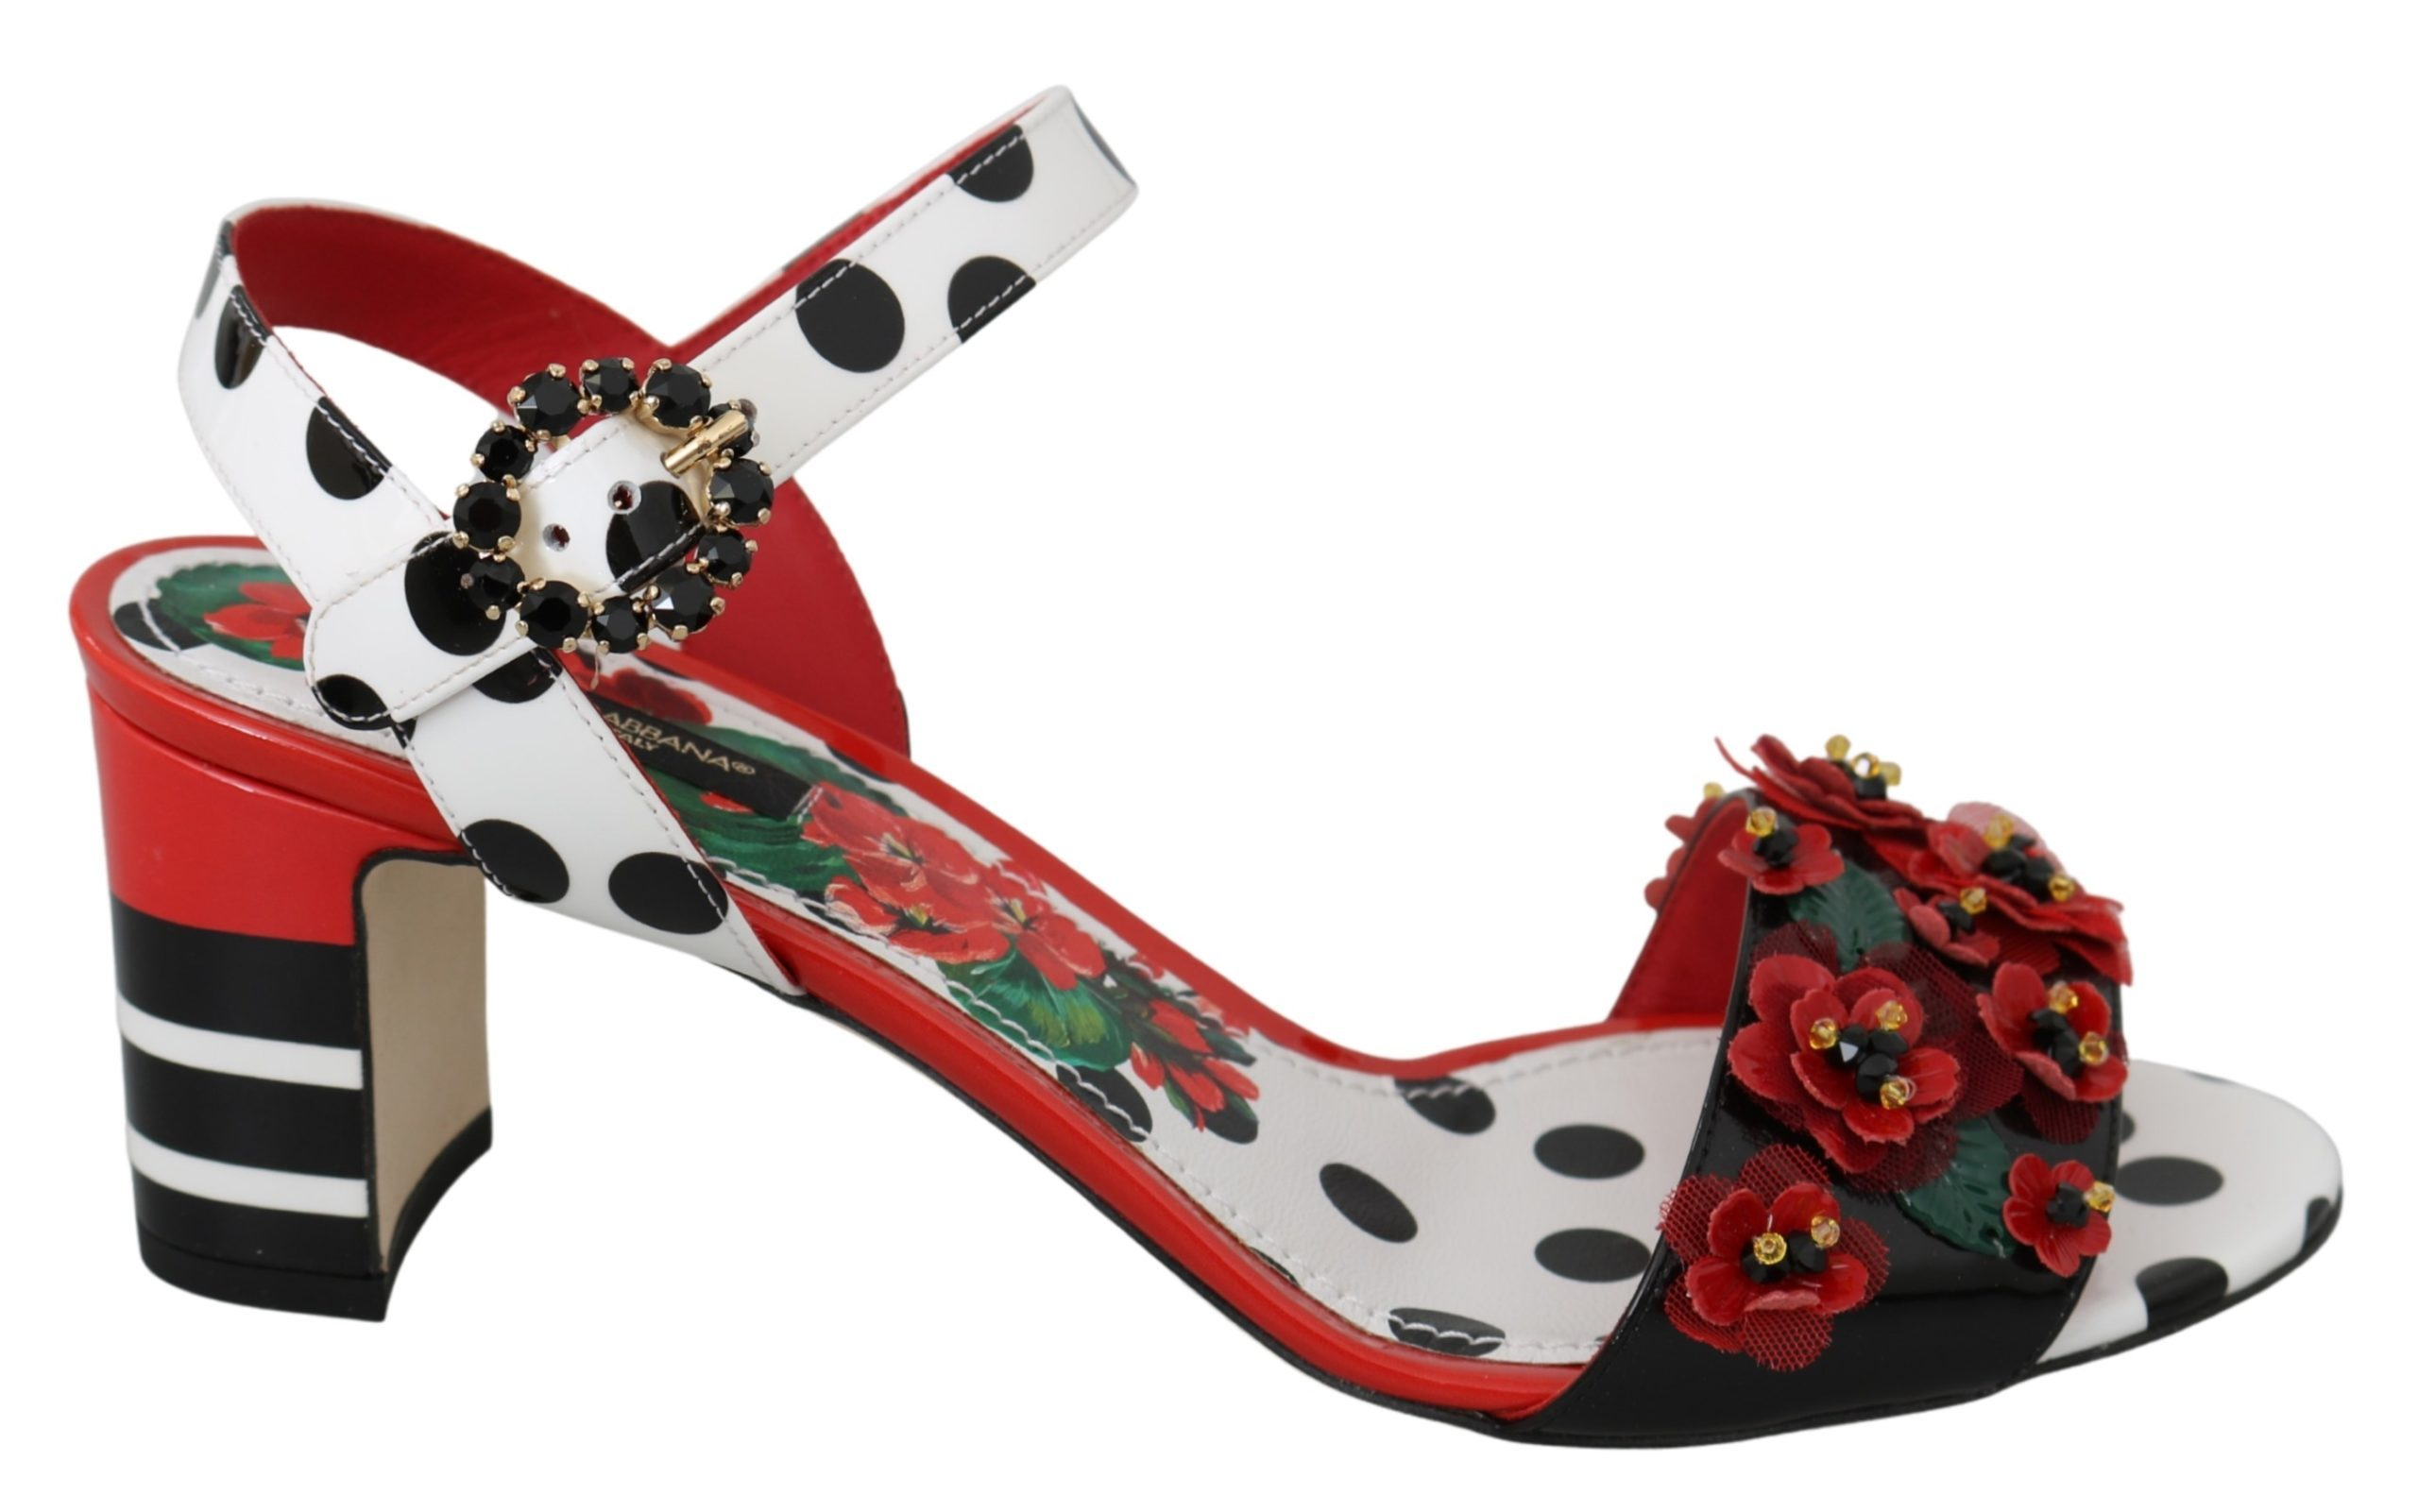 Dolce & Gabbana Women's Floral Crystal Leather Sandal Multicolor LA6994 - EU39/US8.5